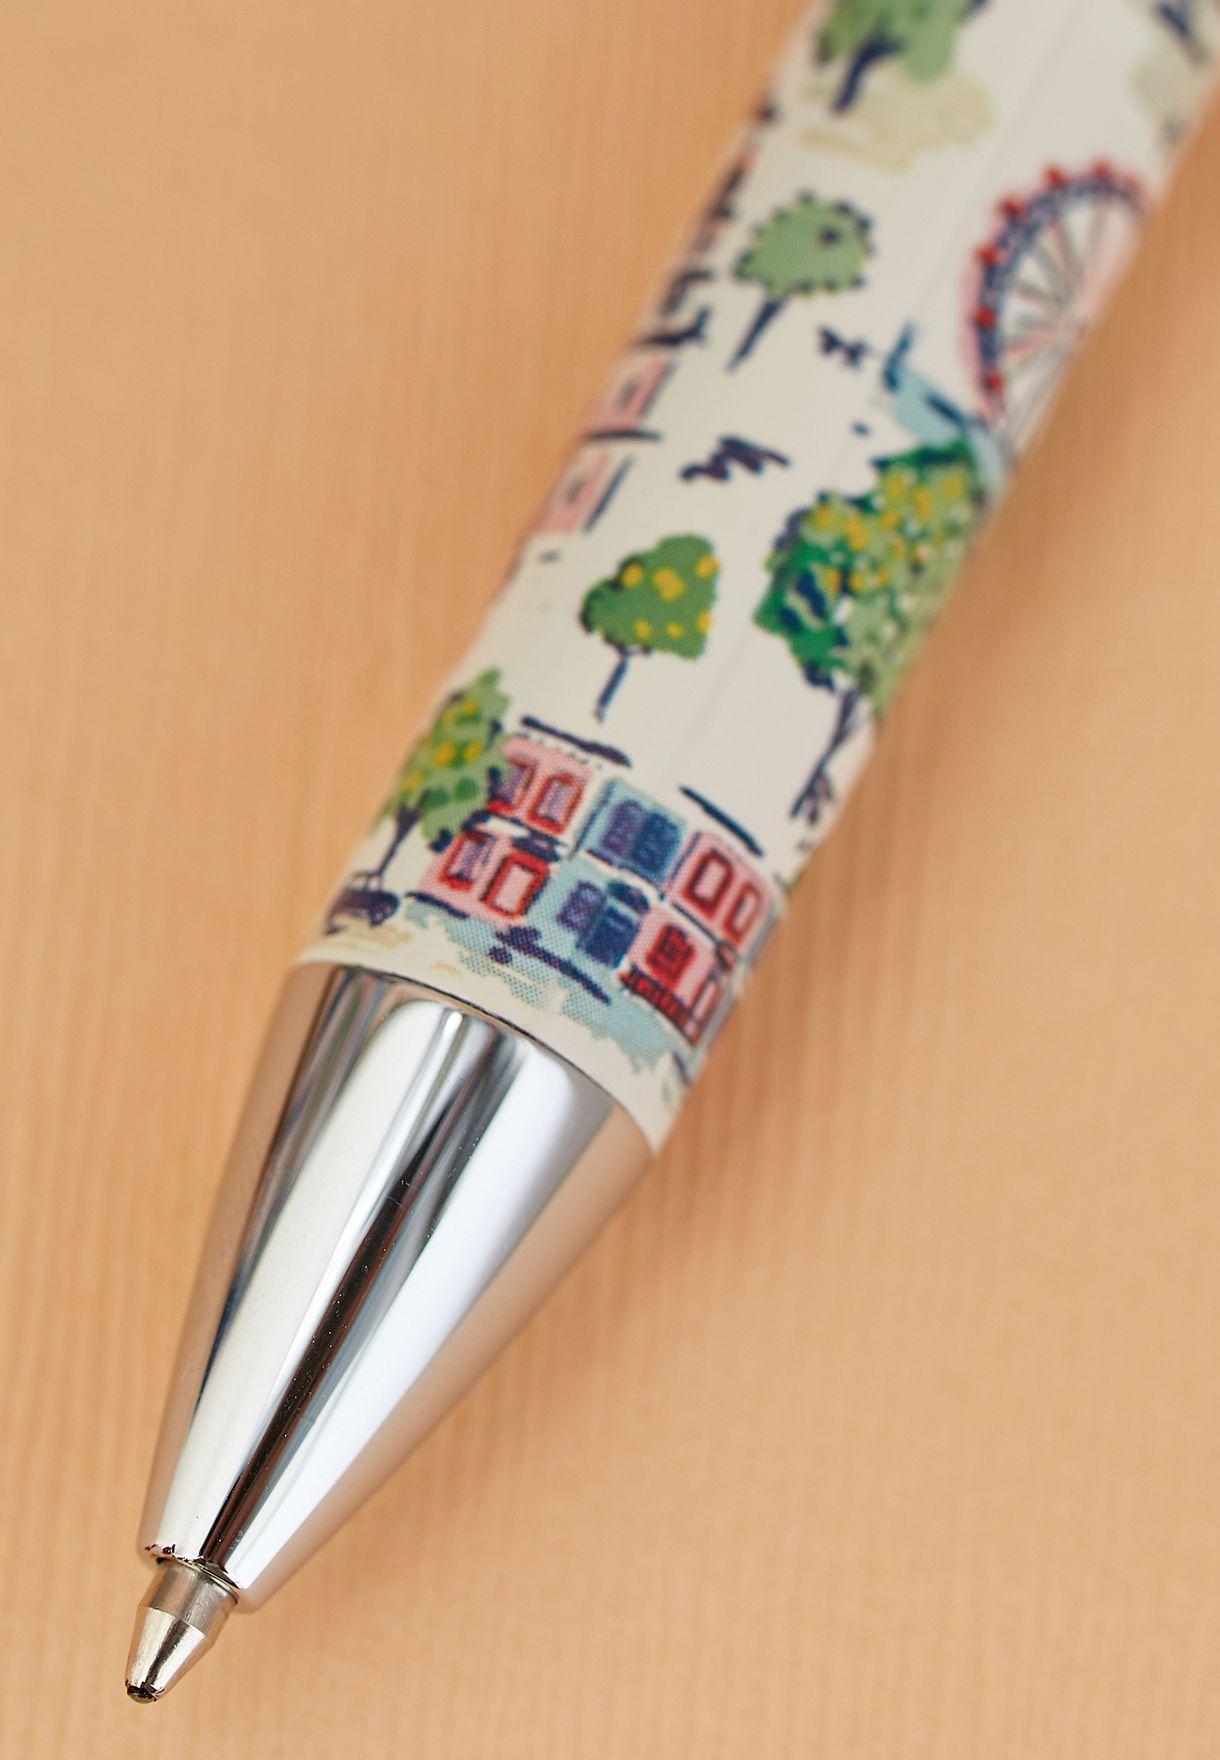 قلم حبر اسود ومقلمة